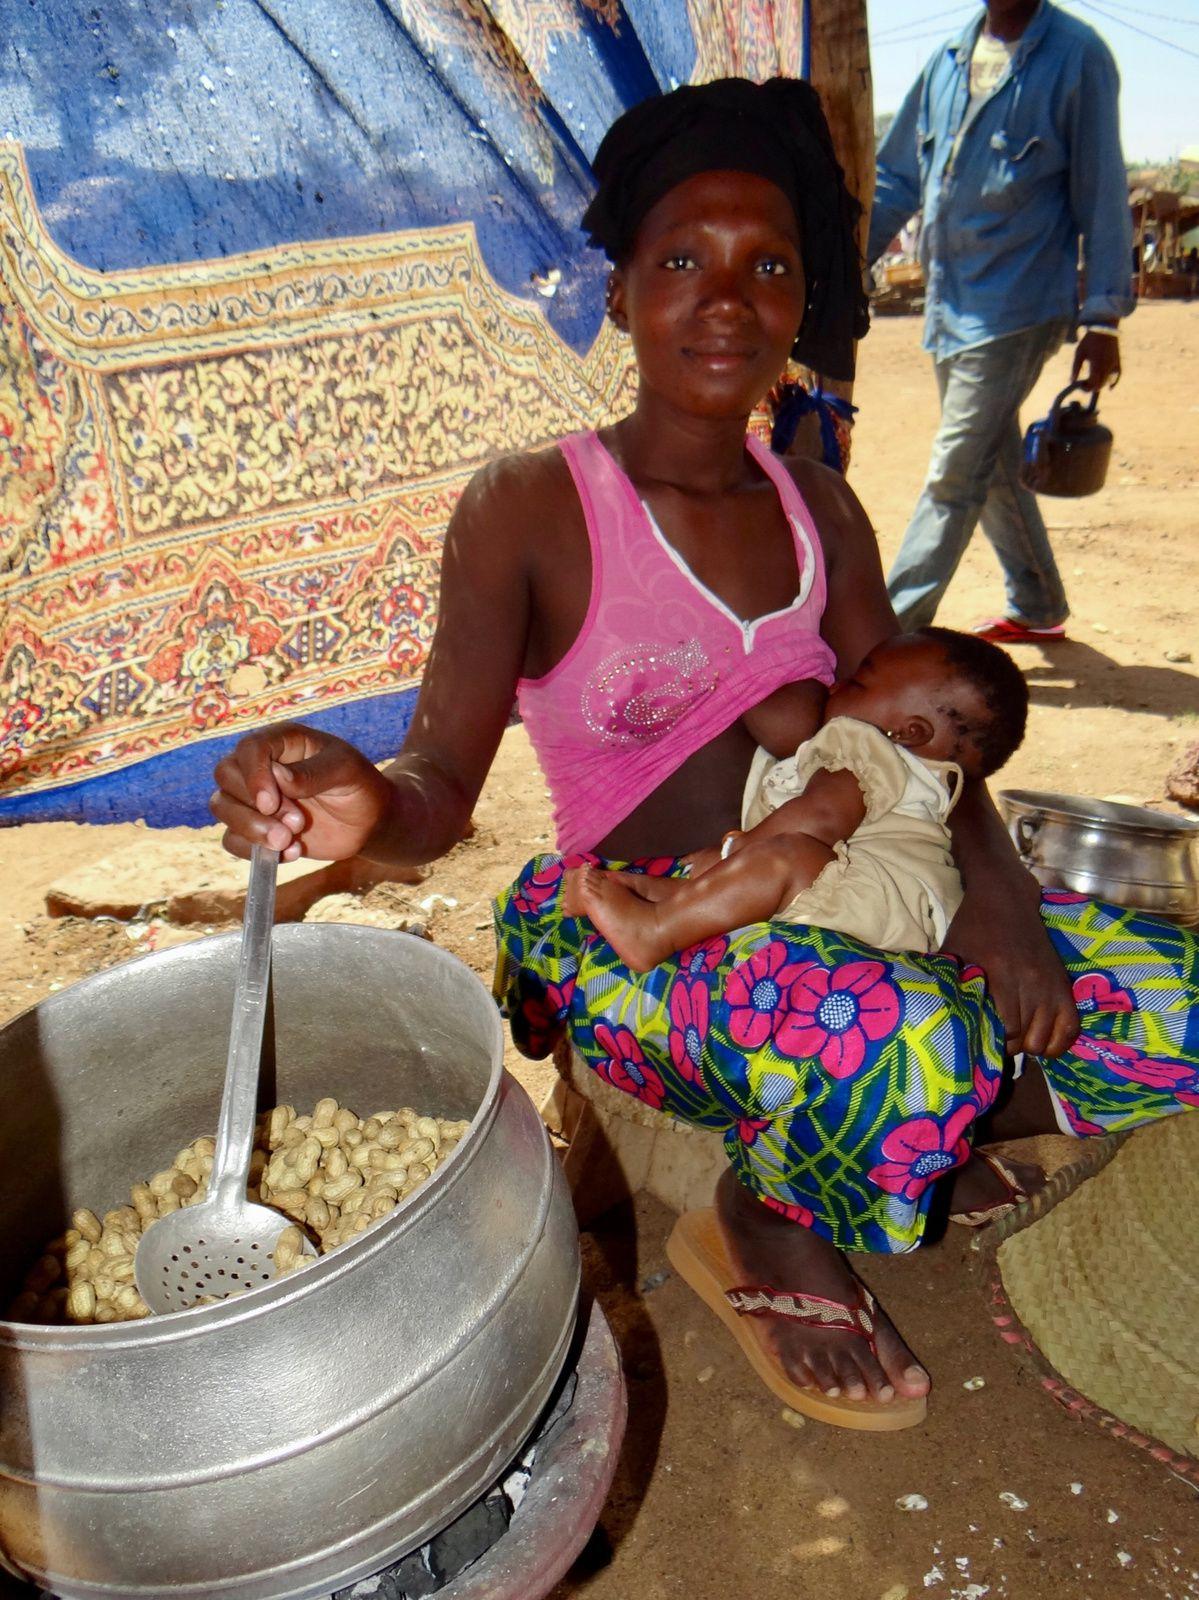 «La grilleuse de cacahuètes» Mali, Koulikoro, 8 novembre 2013.